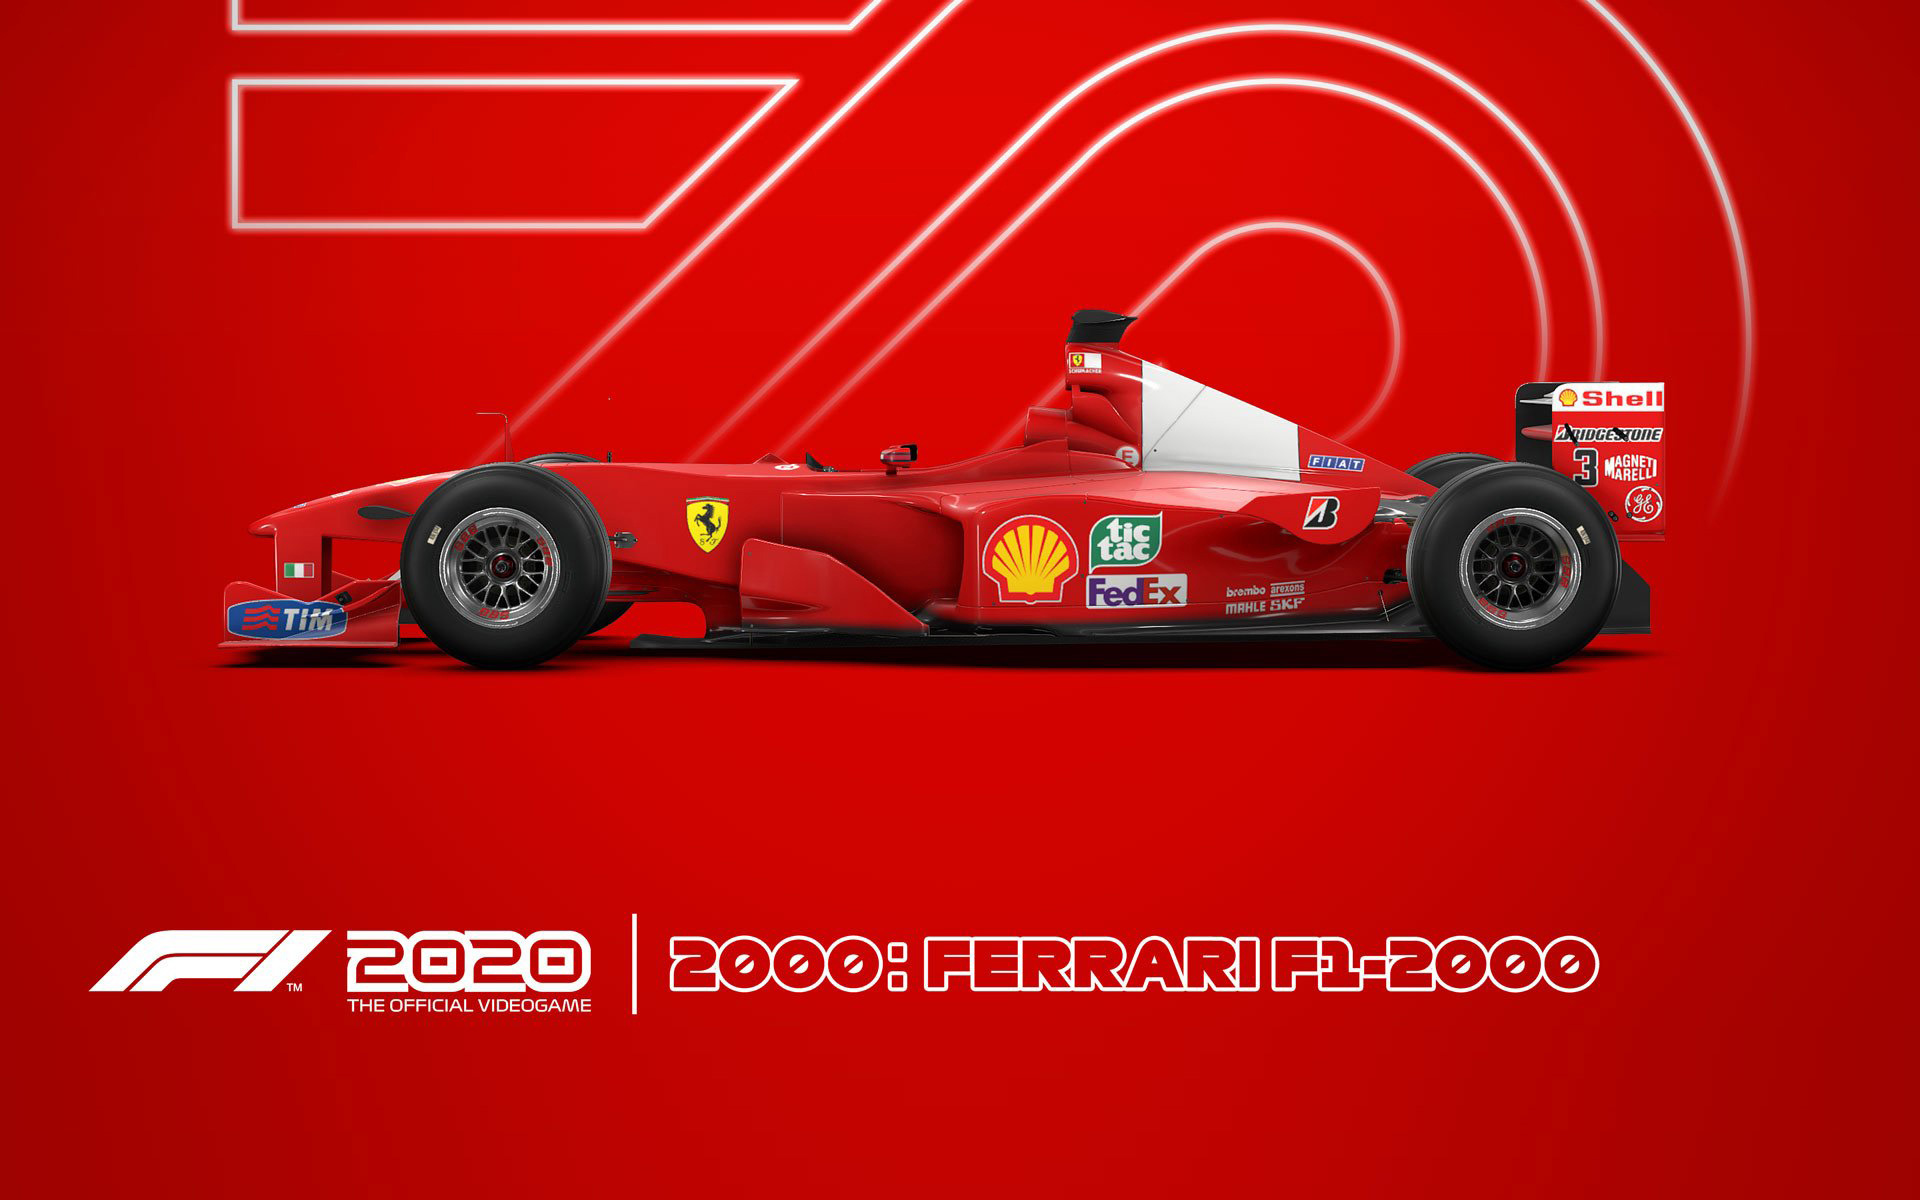 F1 2020 Wallpaper in 1920x1200